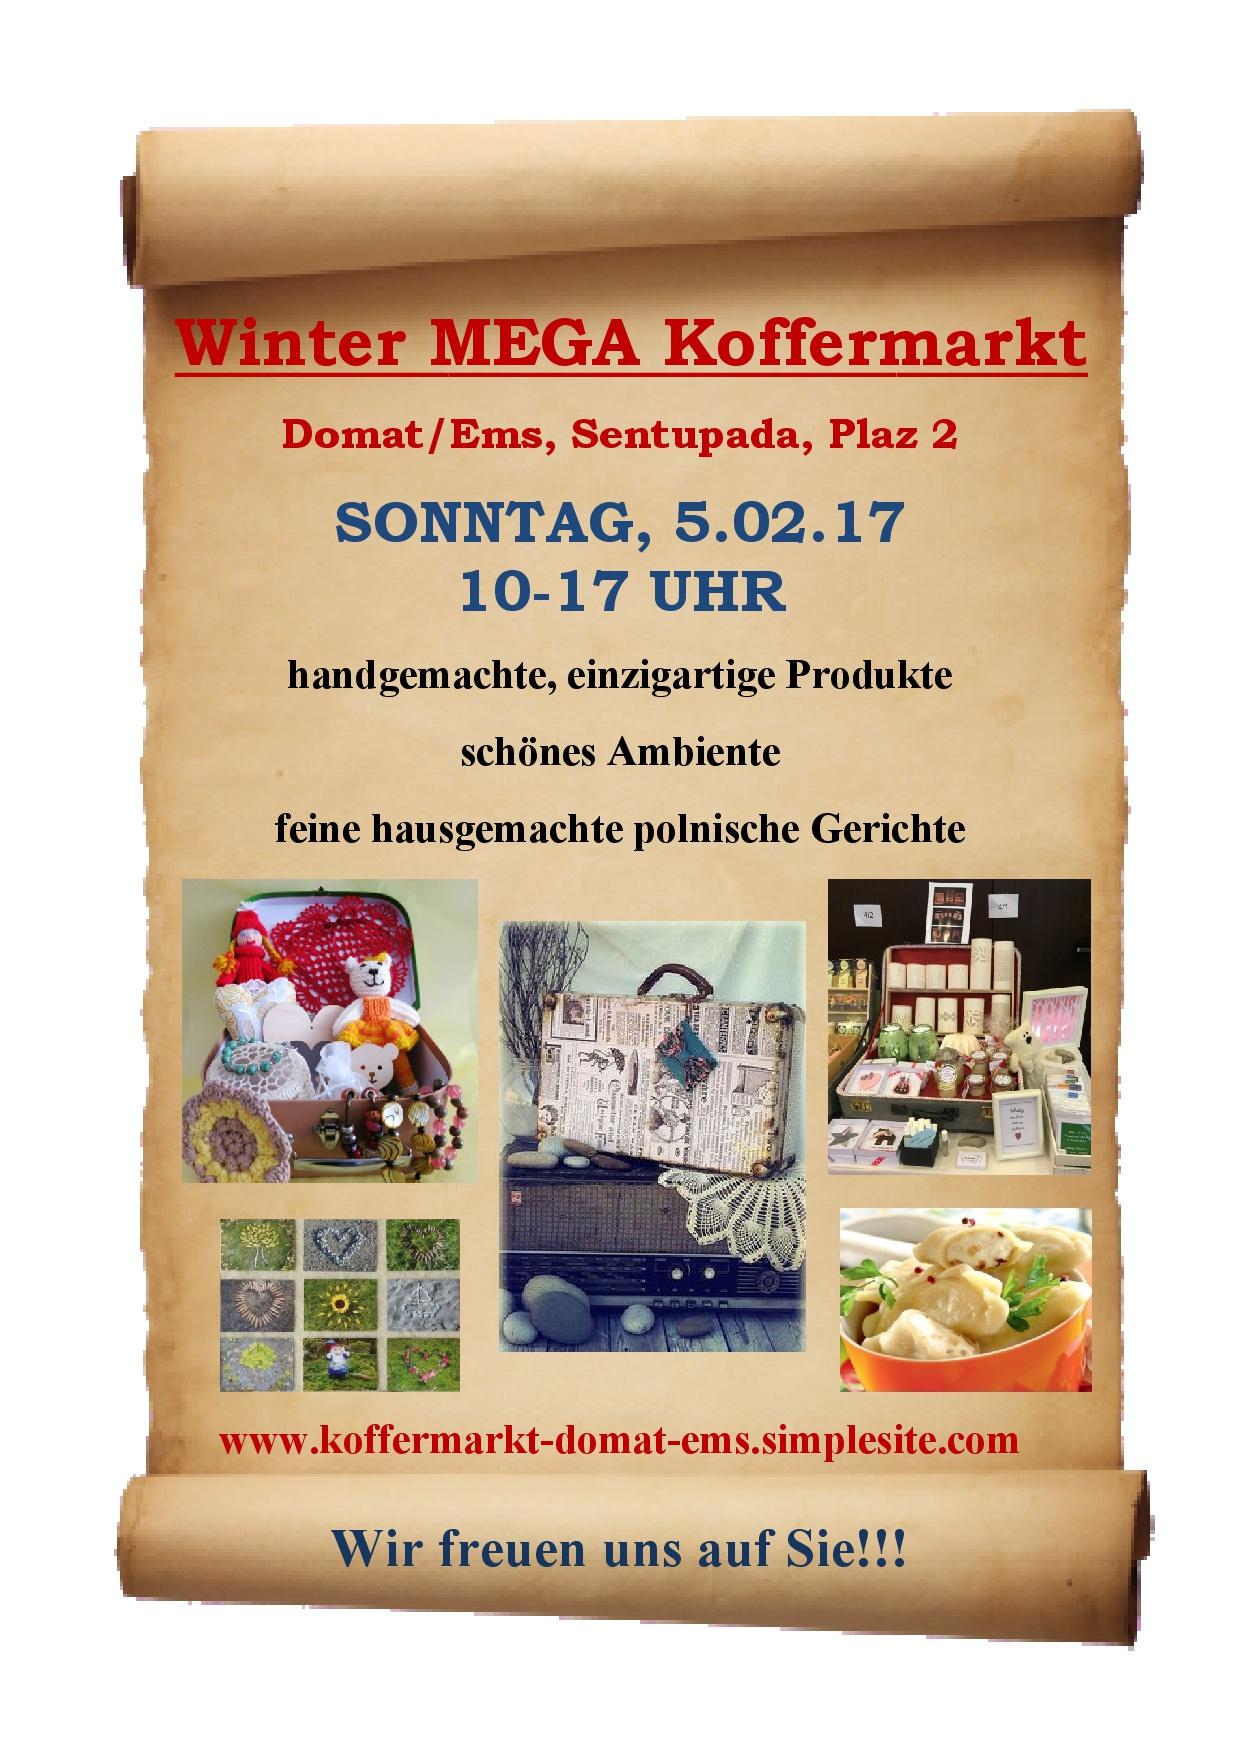 Koffermarkt Domat / Ems GR